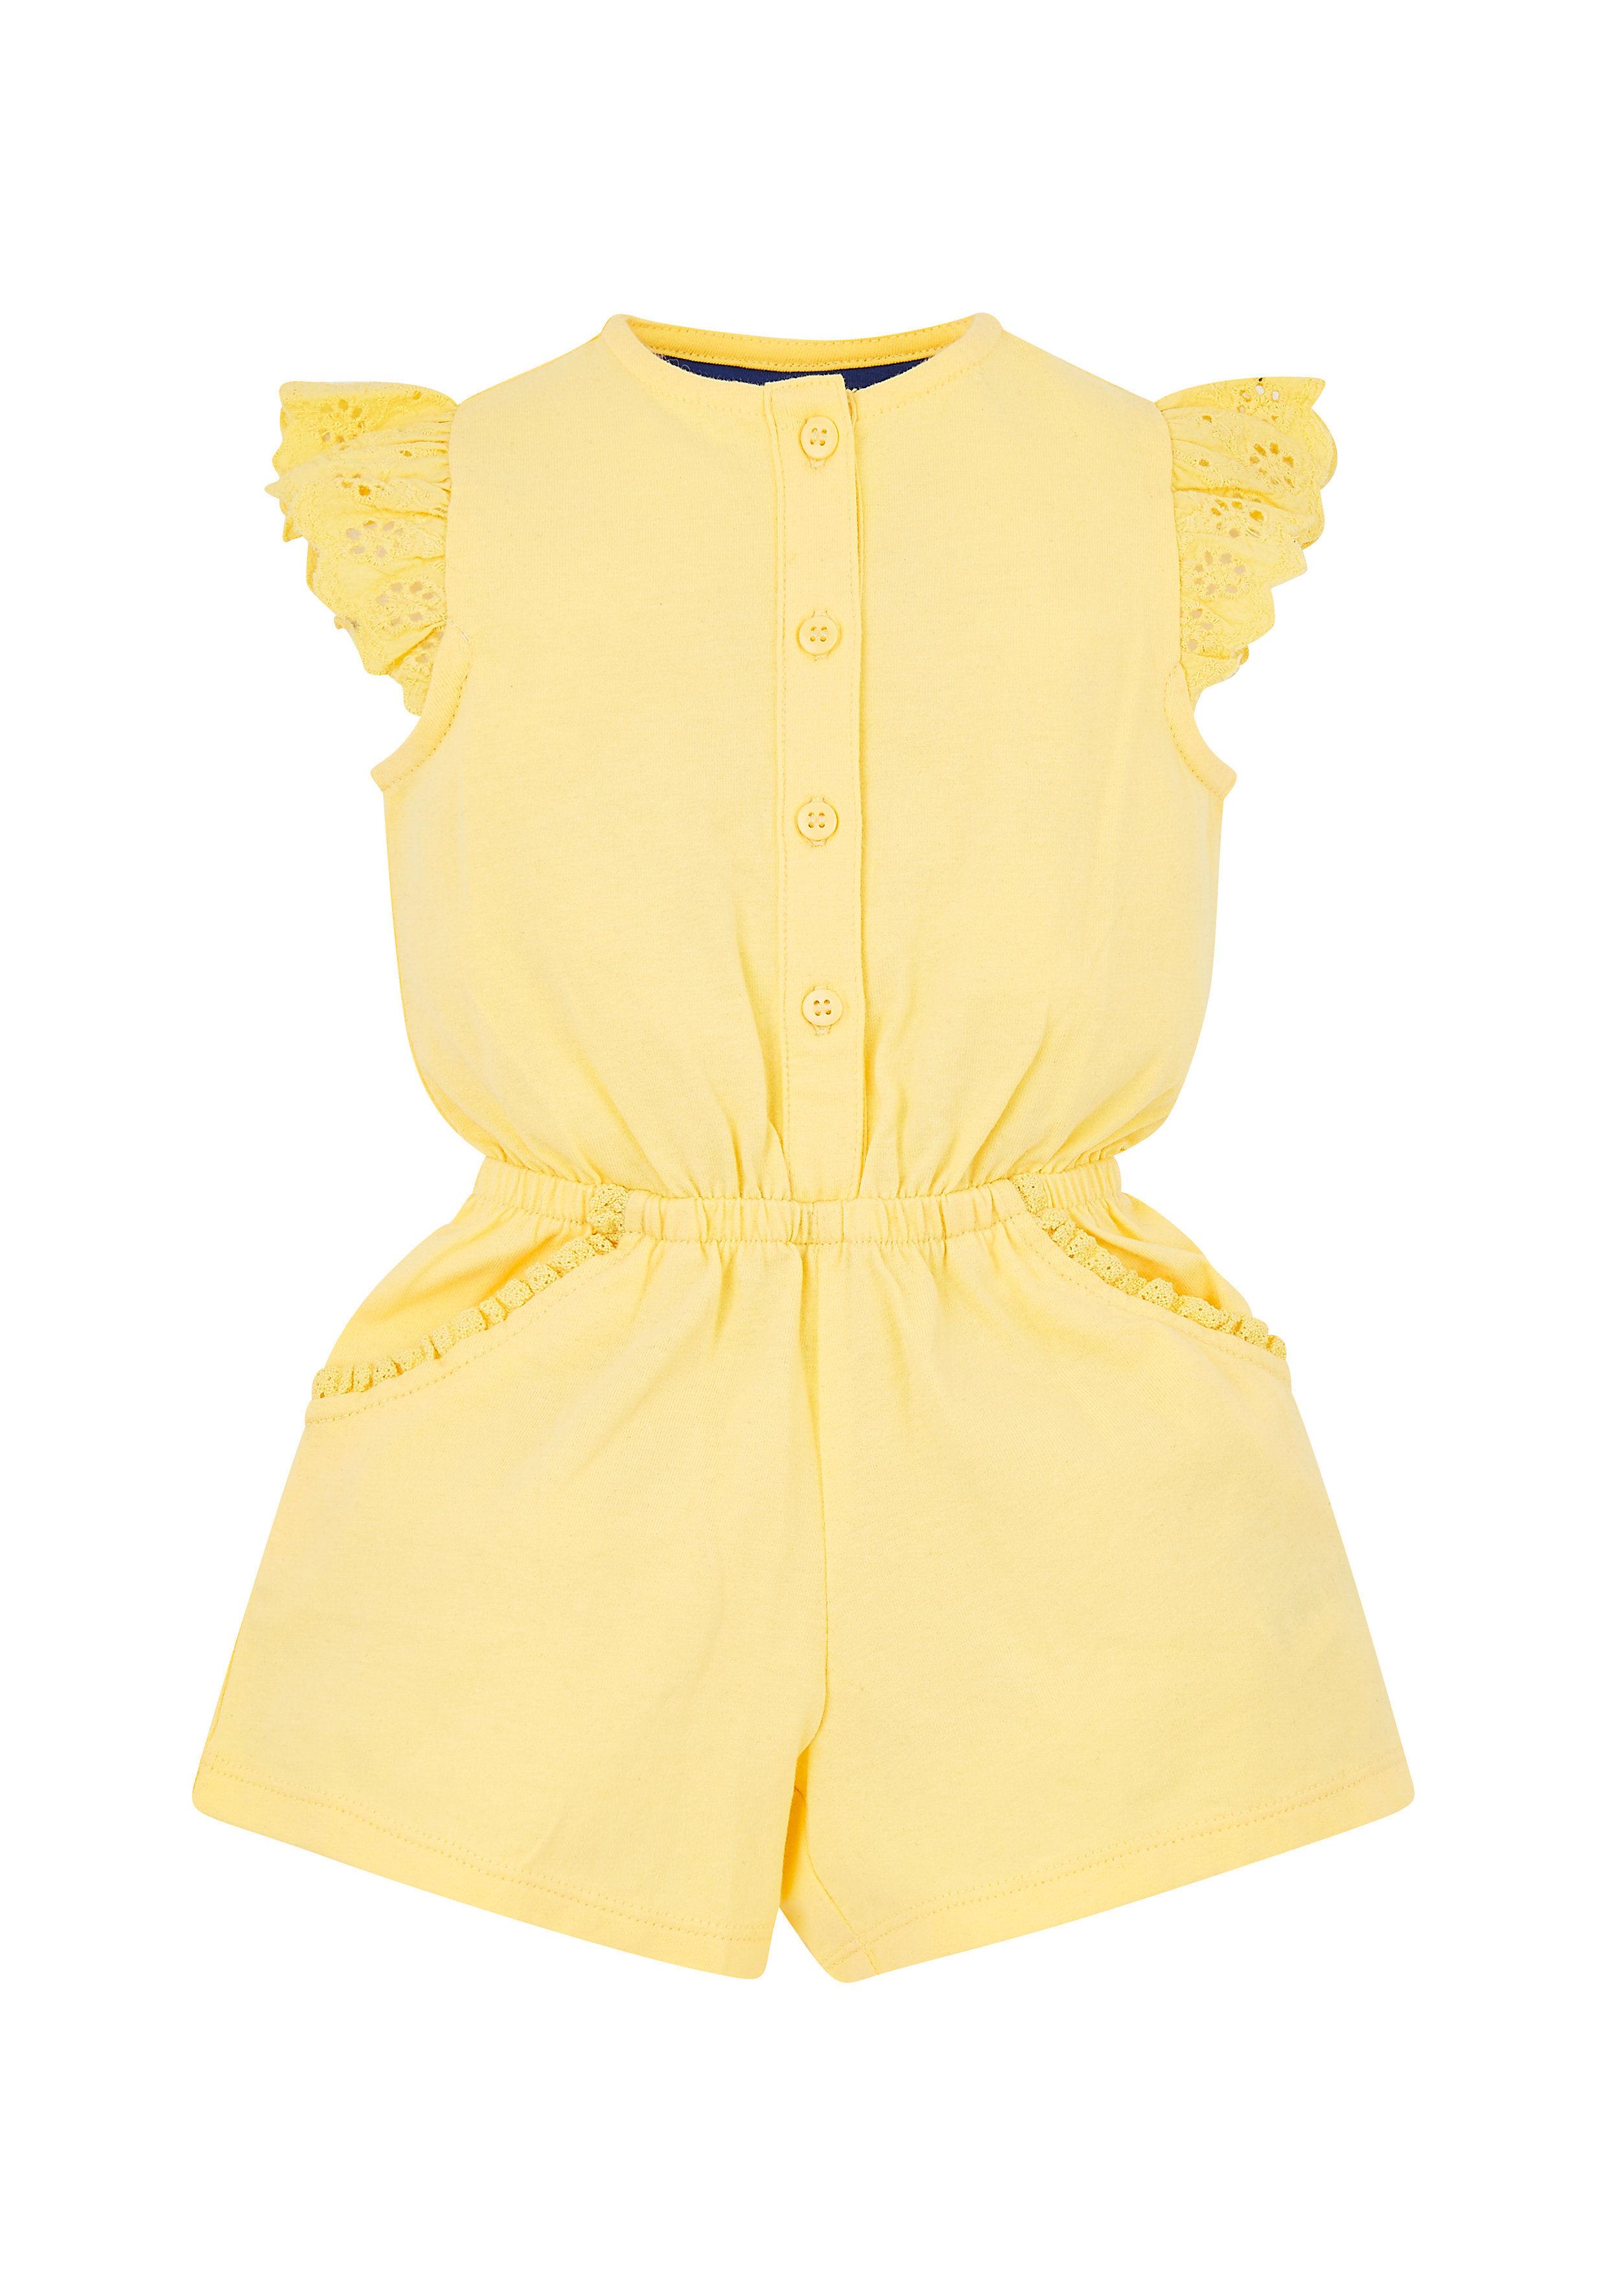 Mothercare   Girls Half Sleeves Playsuit Schiffli Detail - Yellow